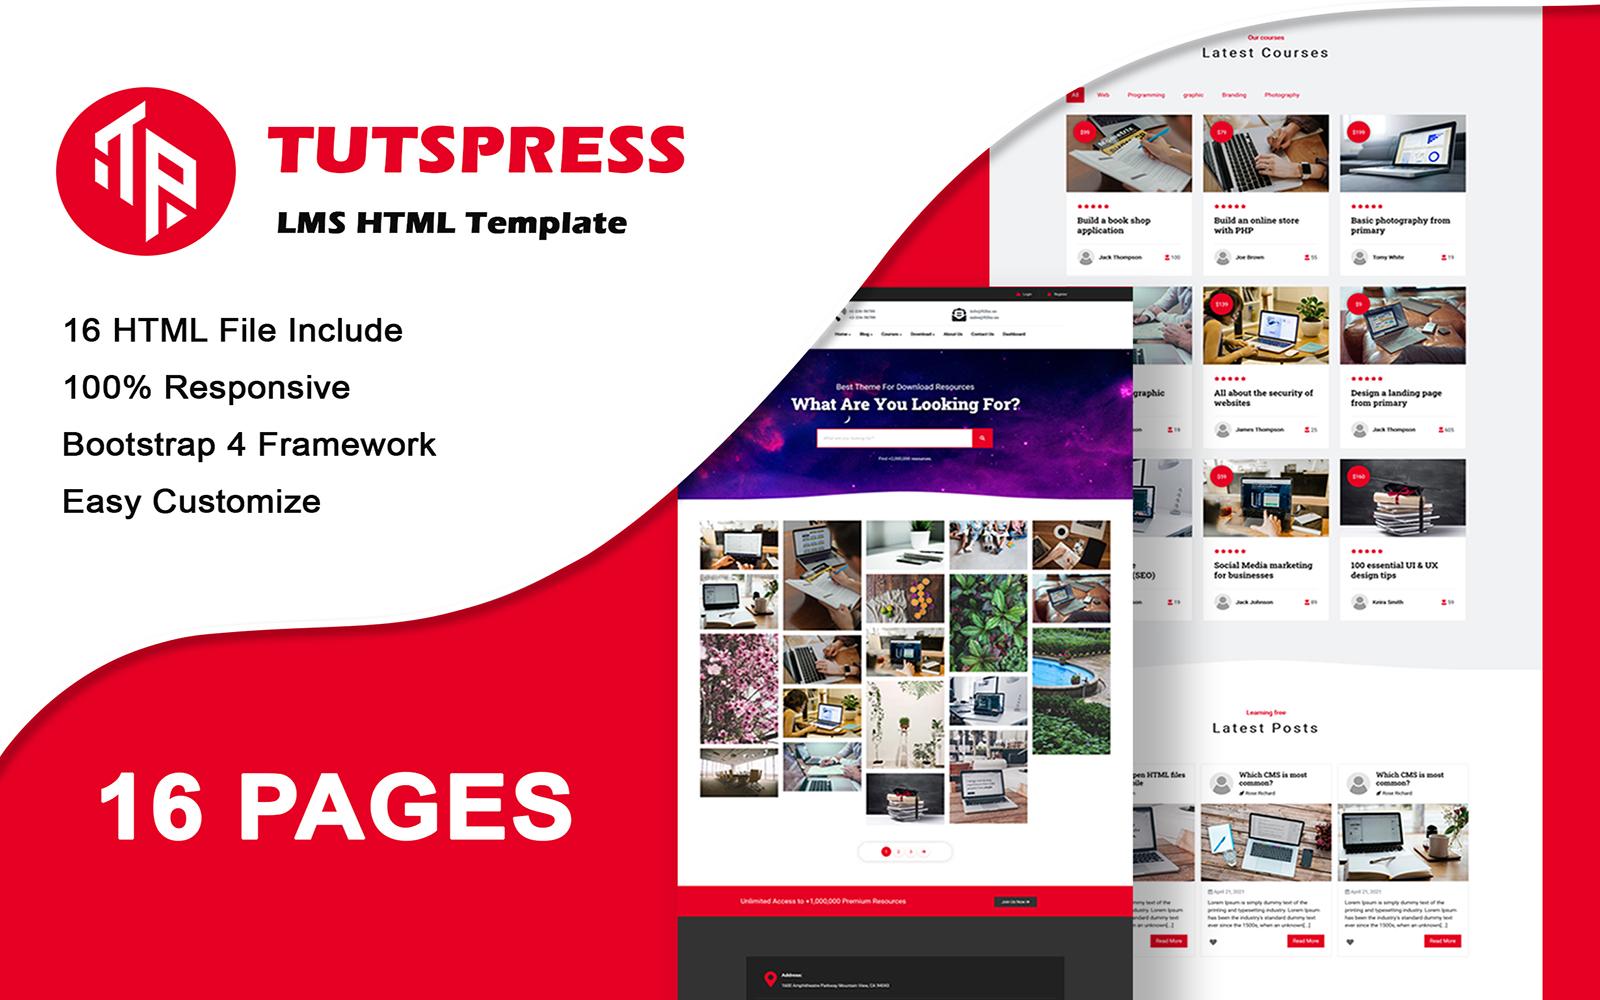 Tutspress - Multipurpose Education HTML Template